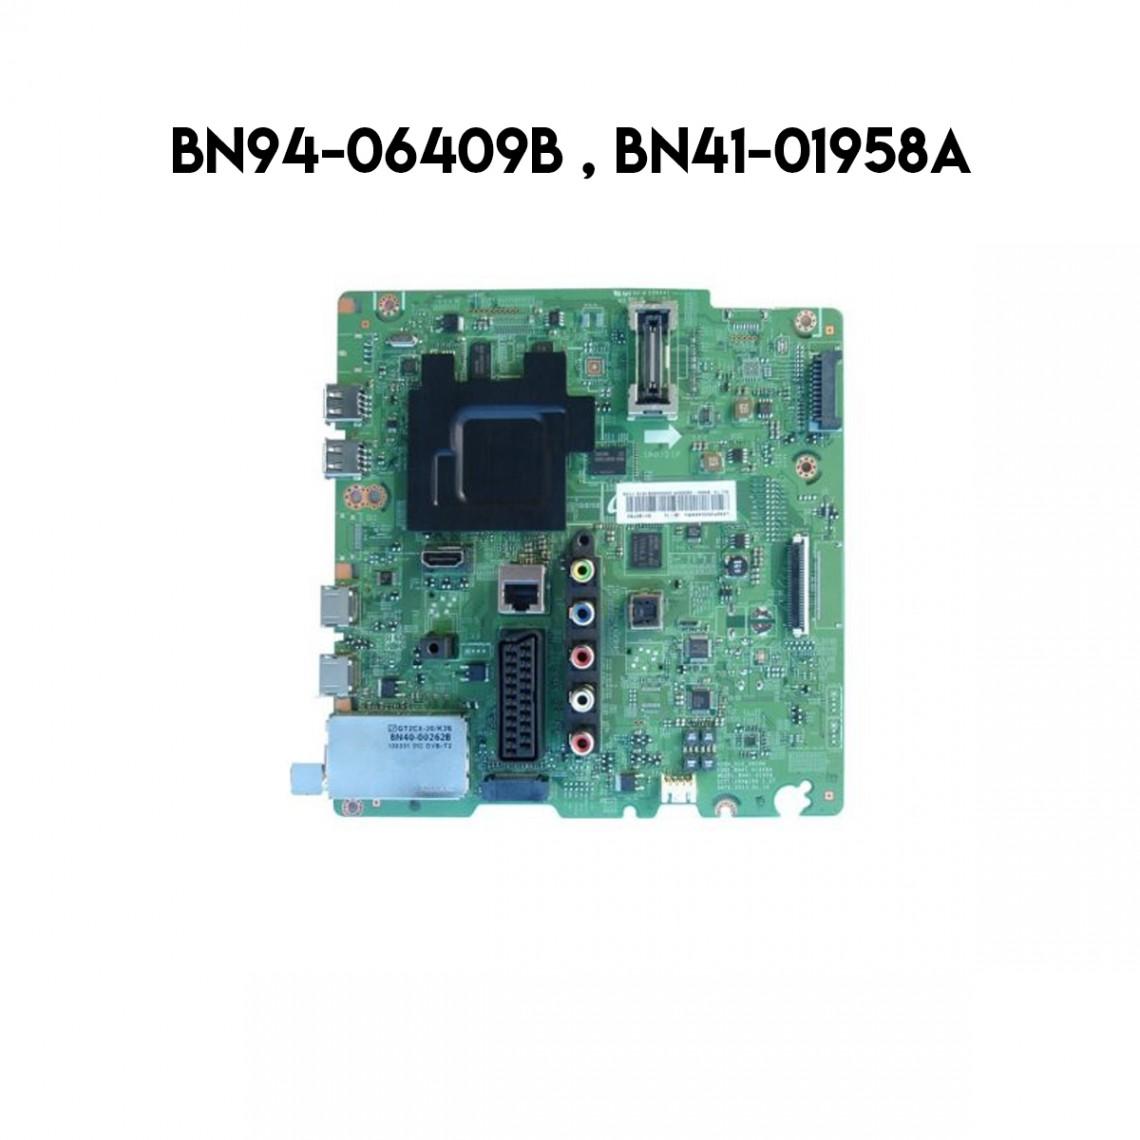 BN94-06409B , BN41-01958A , BN41-01958 , CY-HF320AGLV1H , UE32F4500AW , SAMSUNG MAINBOARD